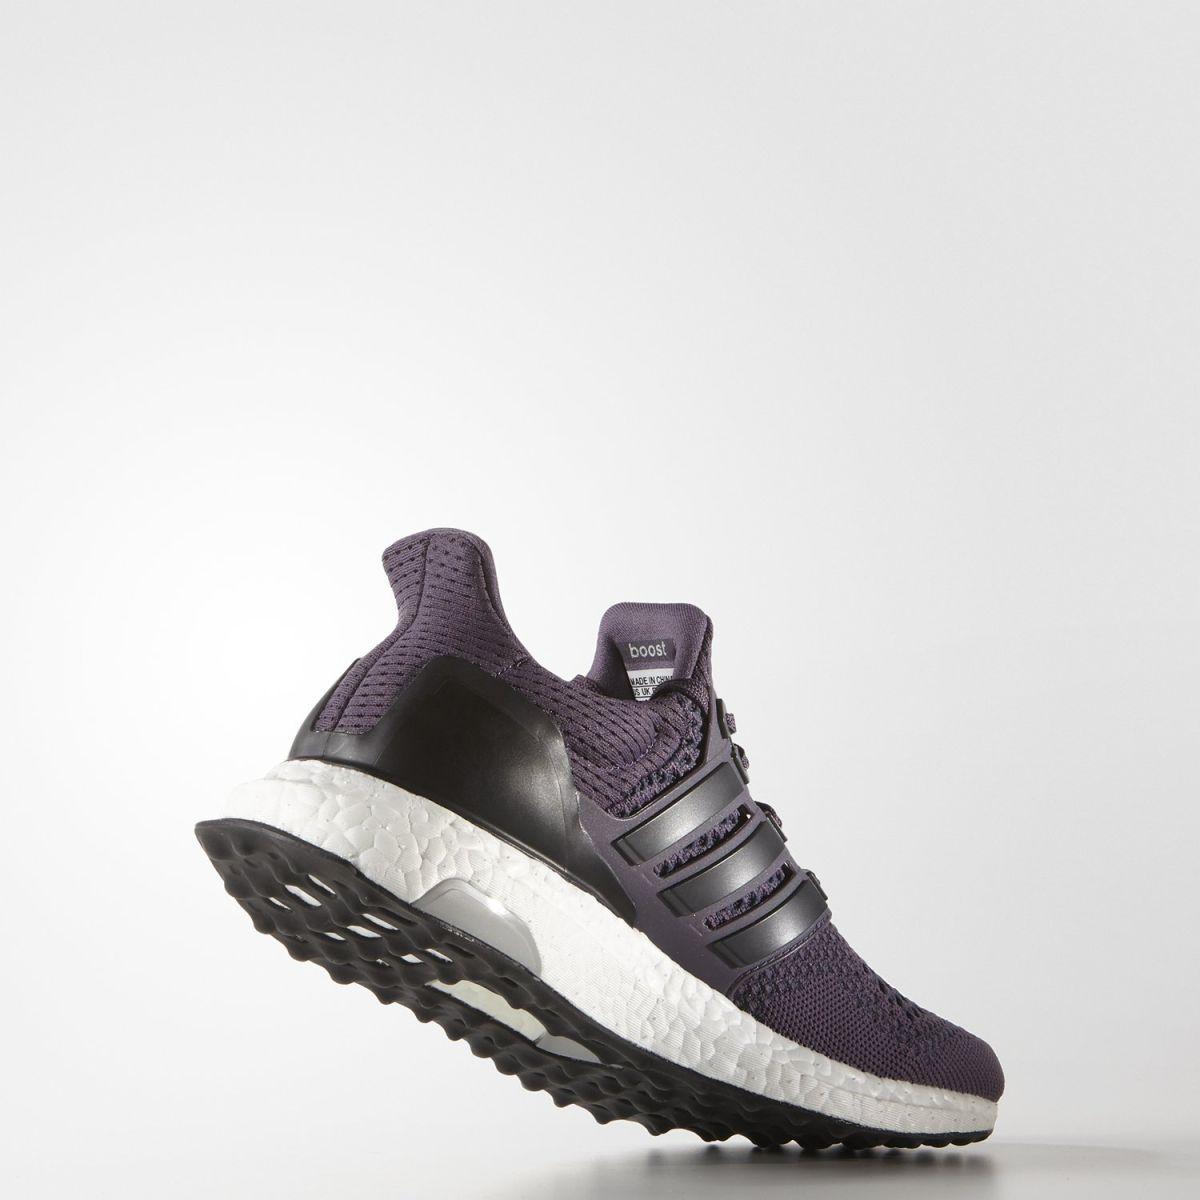 adidas 아디다스우르트라브스트레디스란닝슈즈 S77740